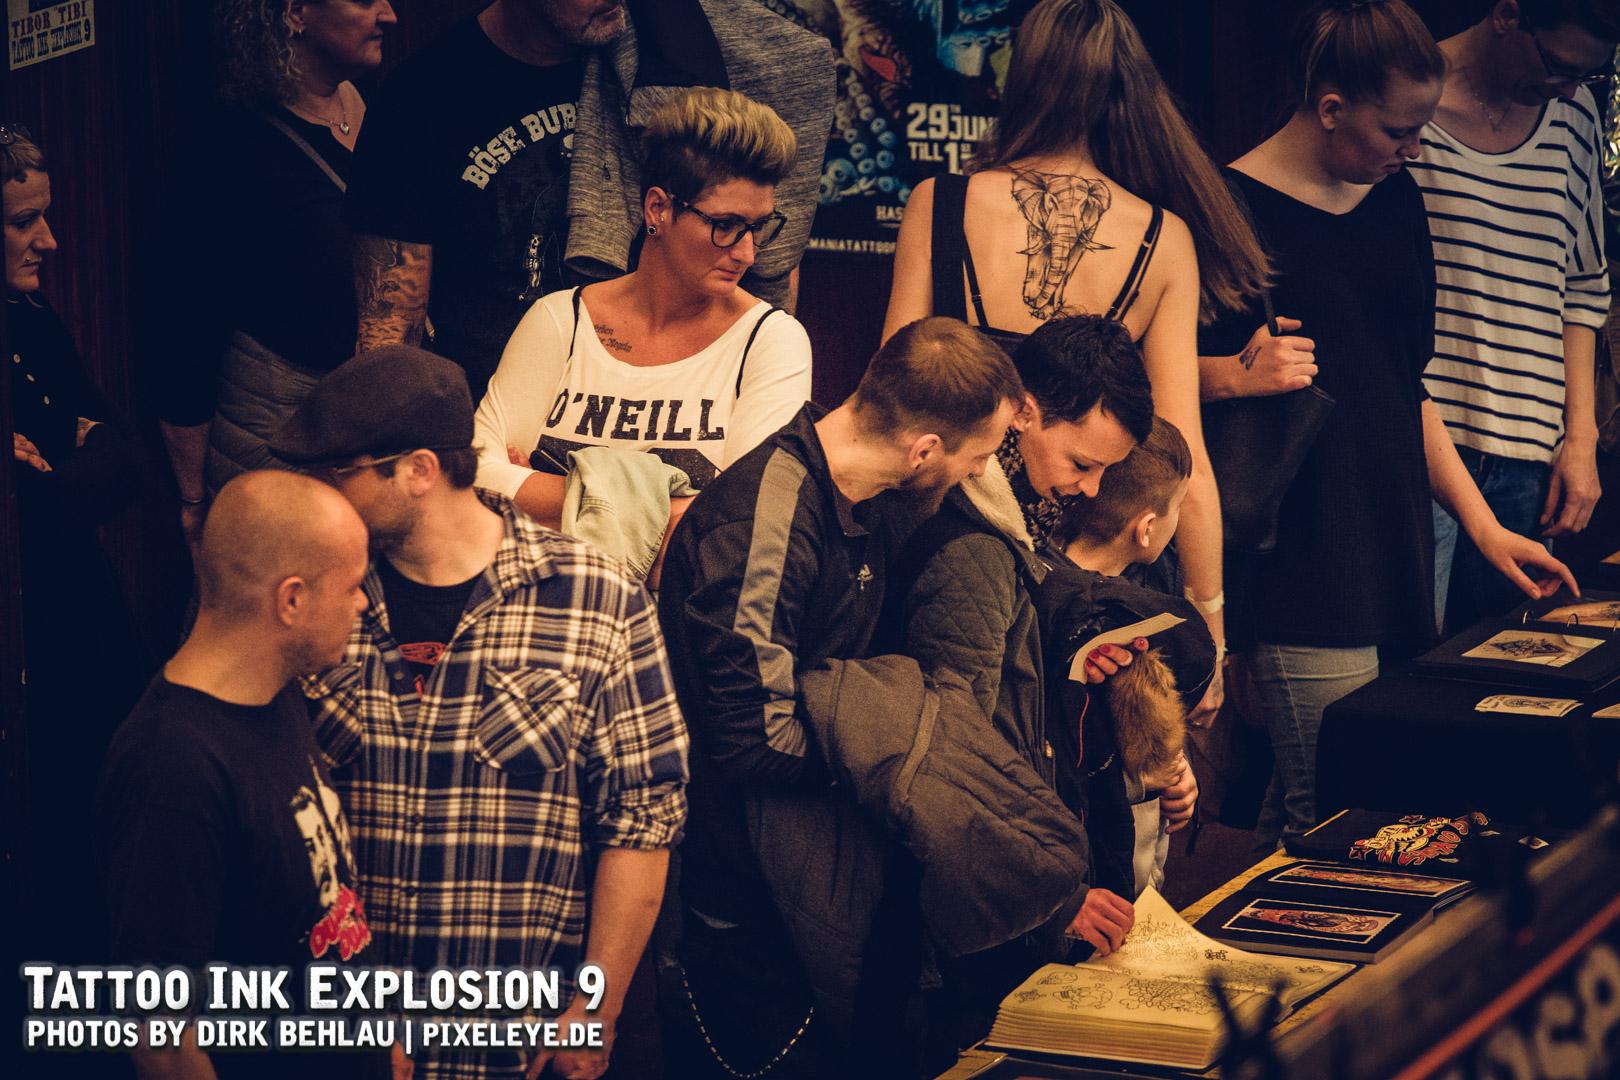 Tattoo Ink Explosion 2018 WEB by Dirk Behlau-1416.jpg